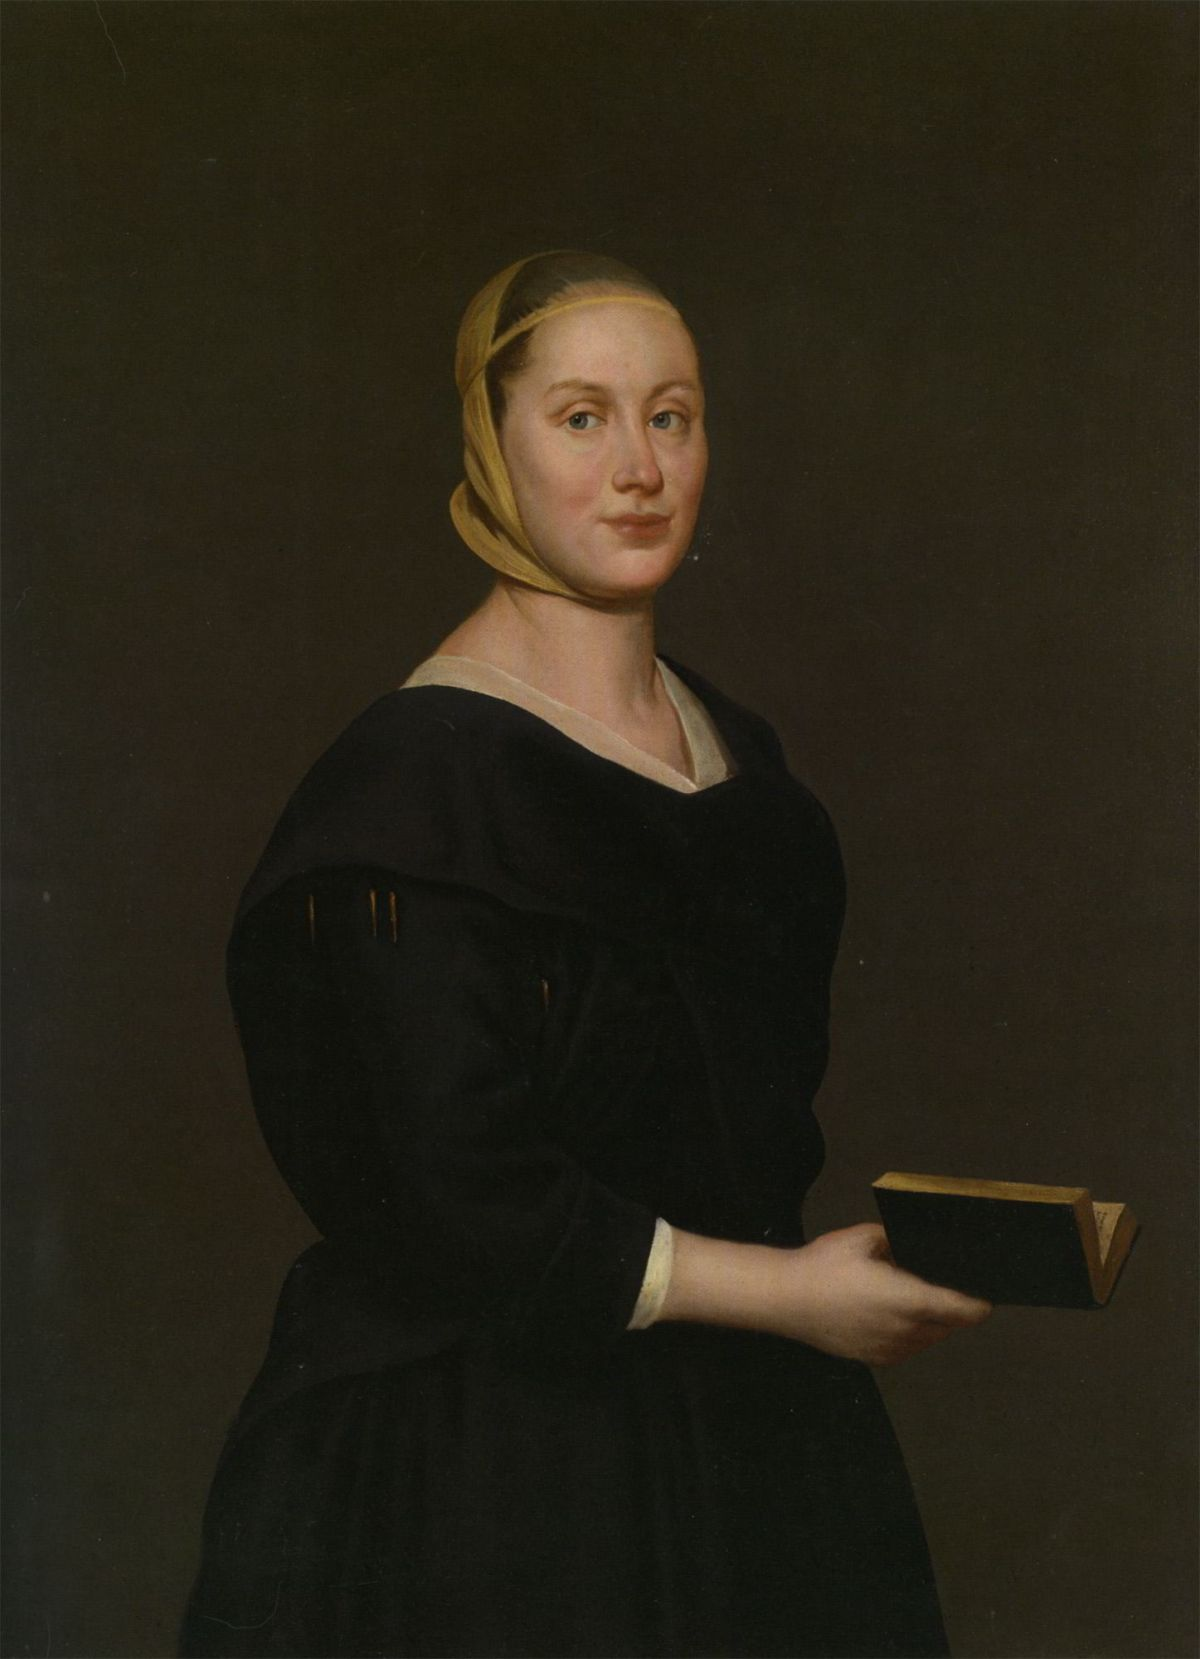 Portrait of Donna Alba Regina del Ferro  three quarter length in a black dress holding a book by Giacomo Ceruti